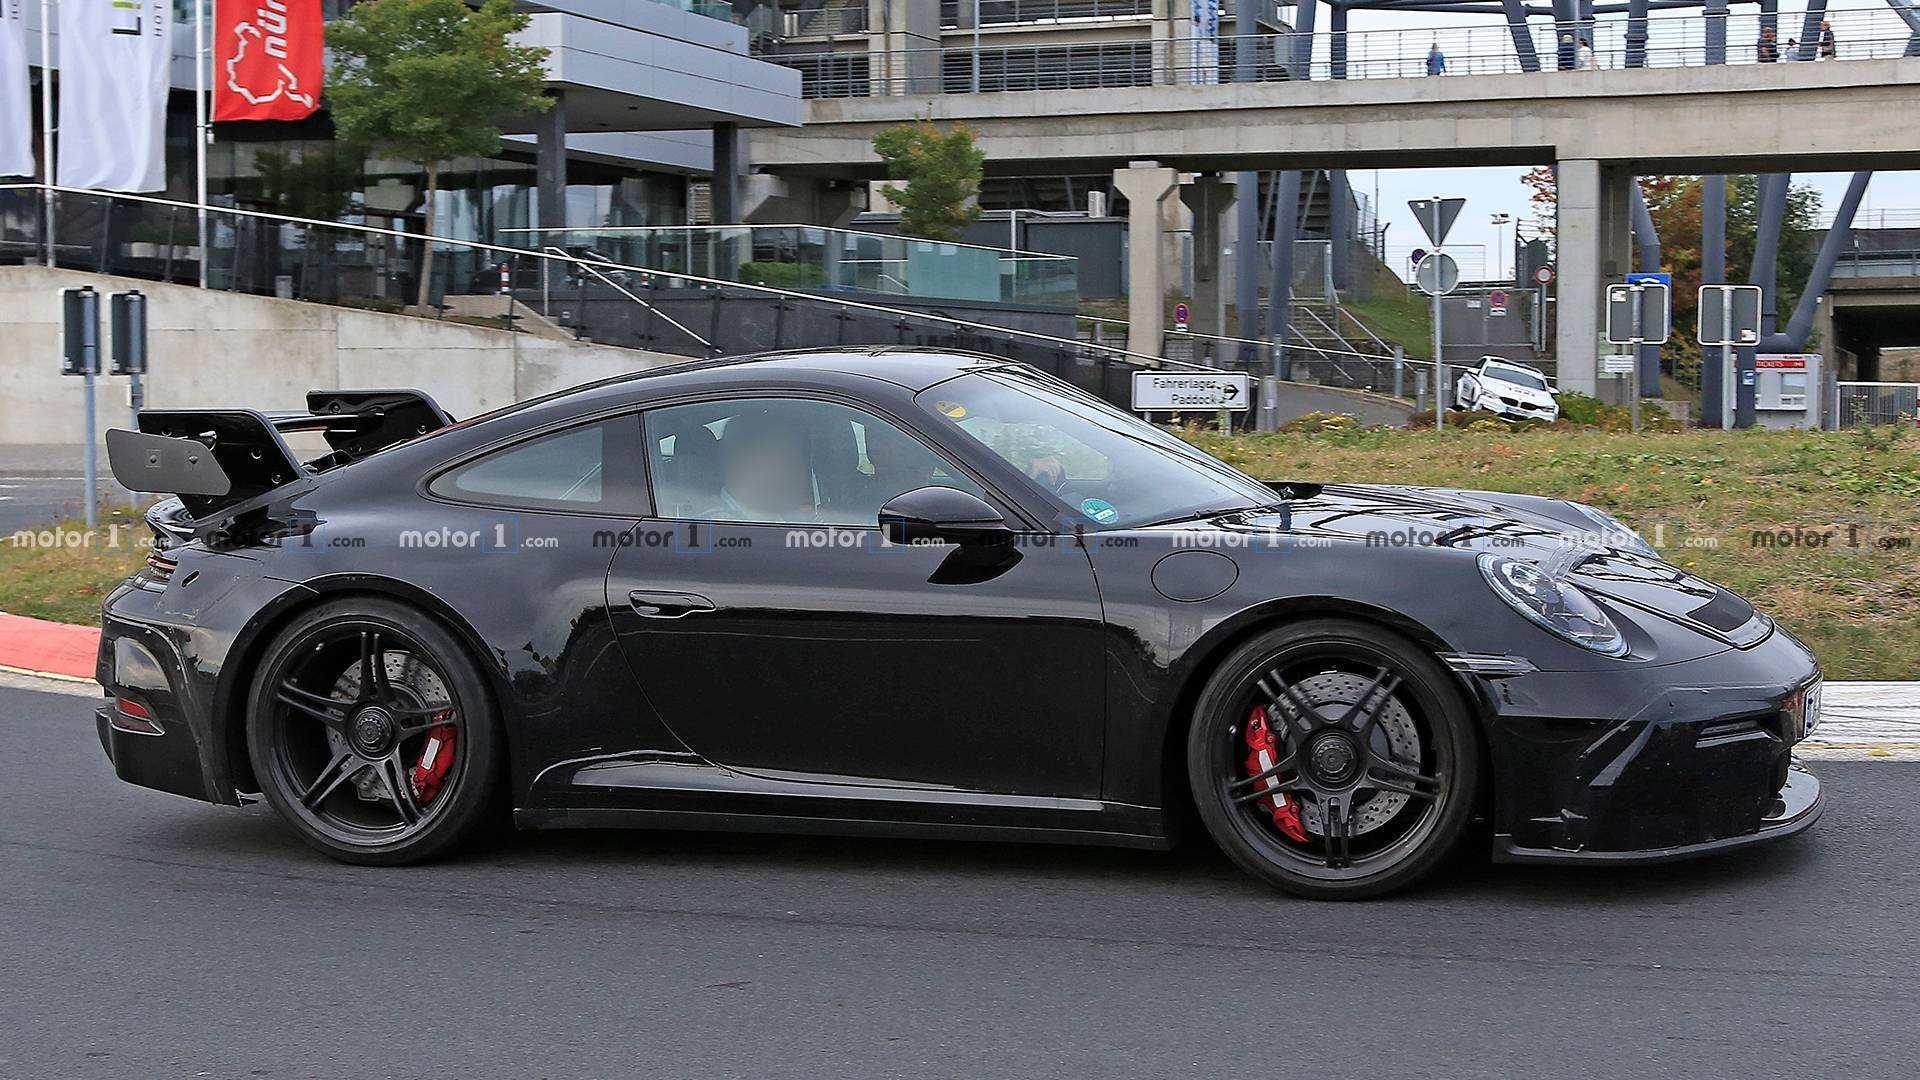 12 New 2020 Porsche 911 Gt3 Exterior and Interior with 2020 Porsche 911 Gt3